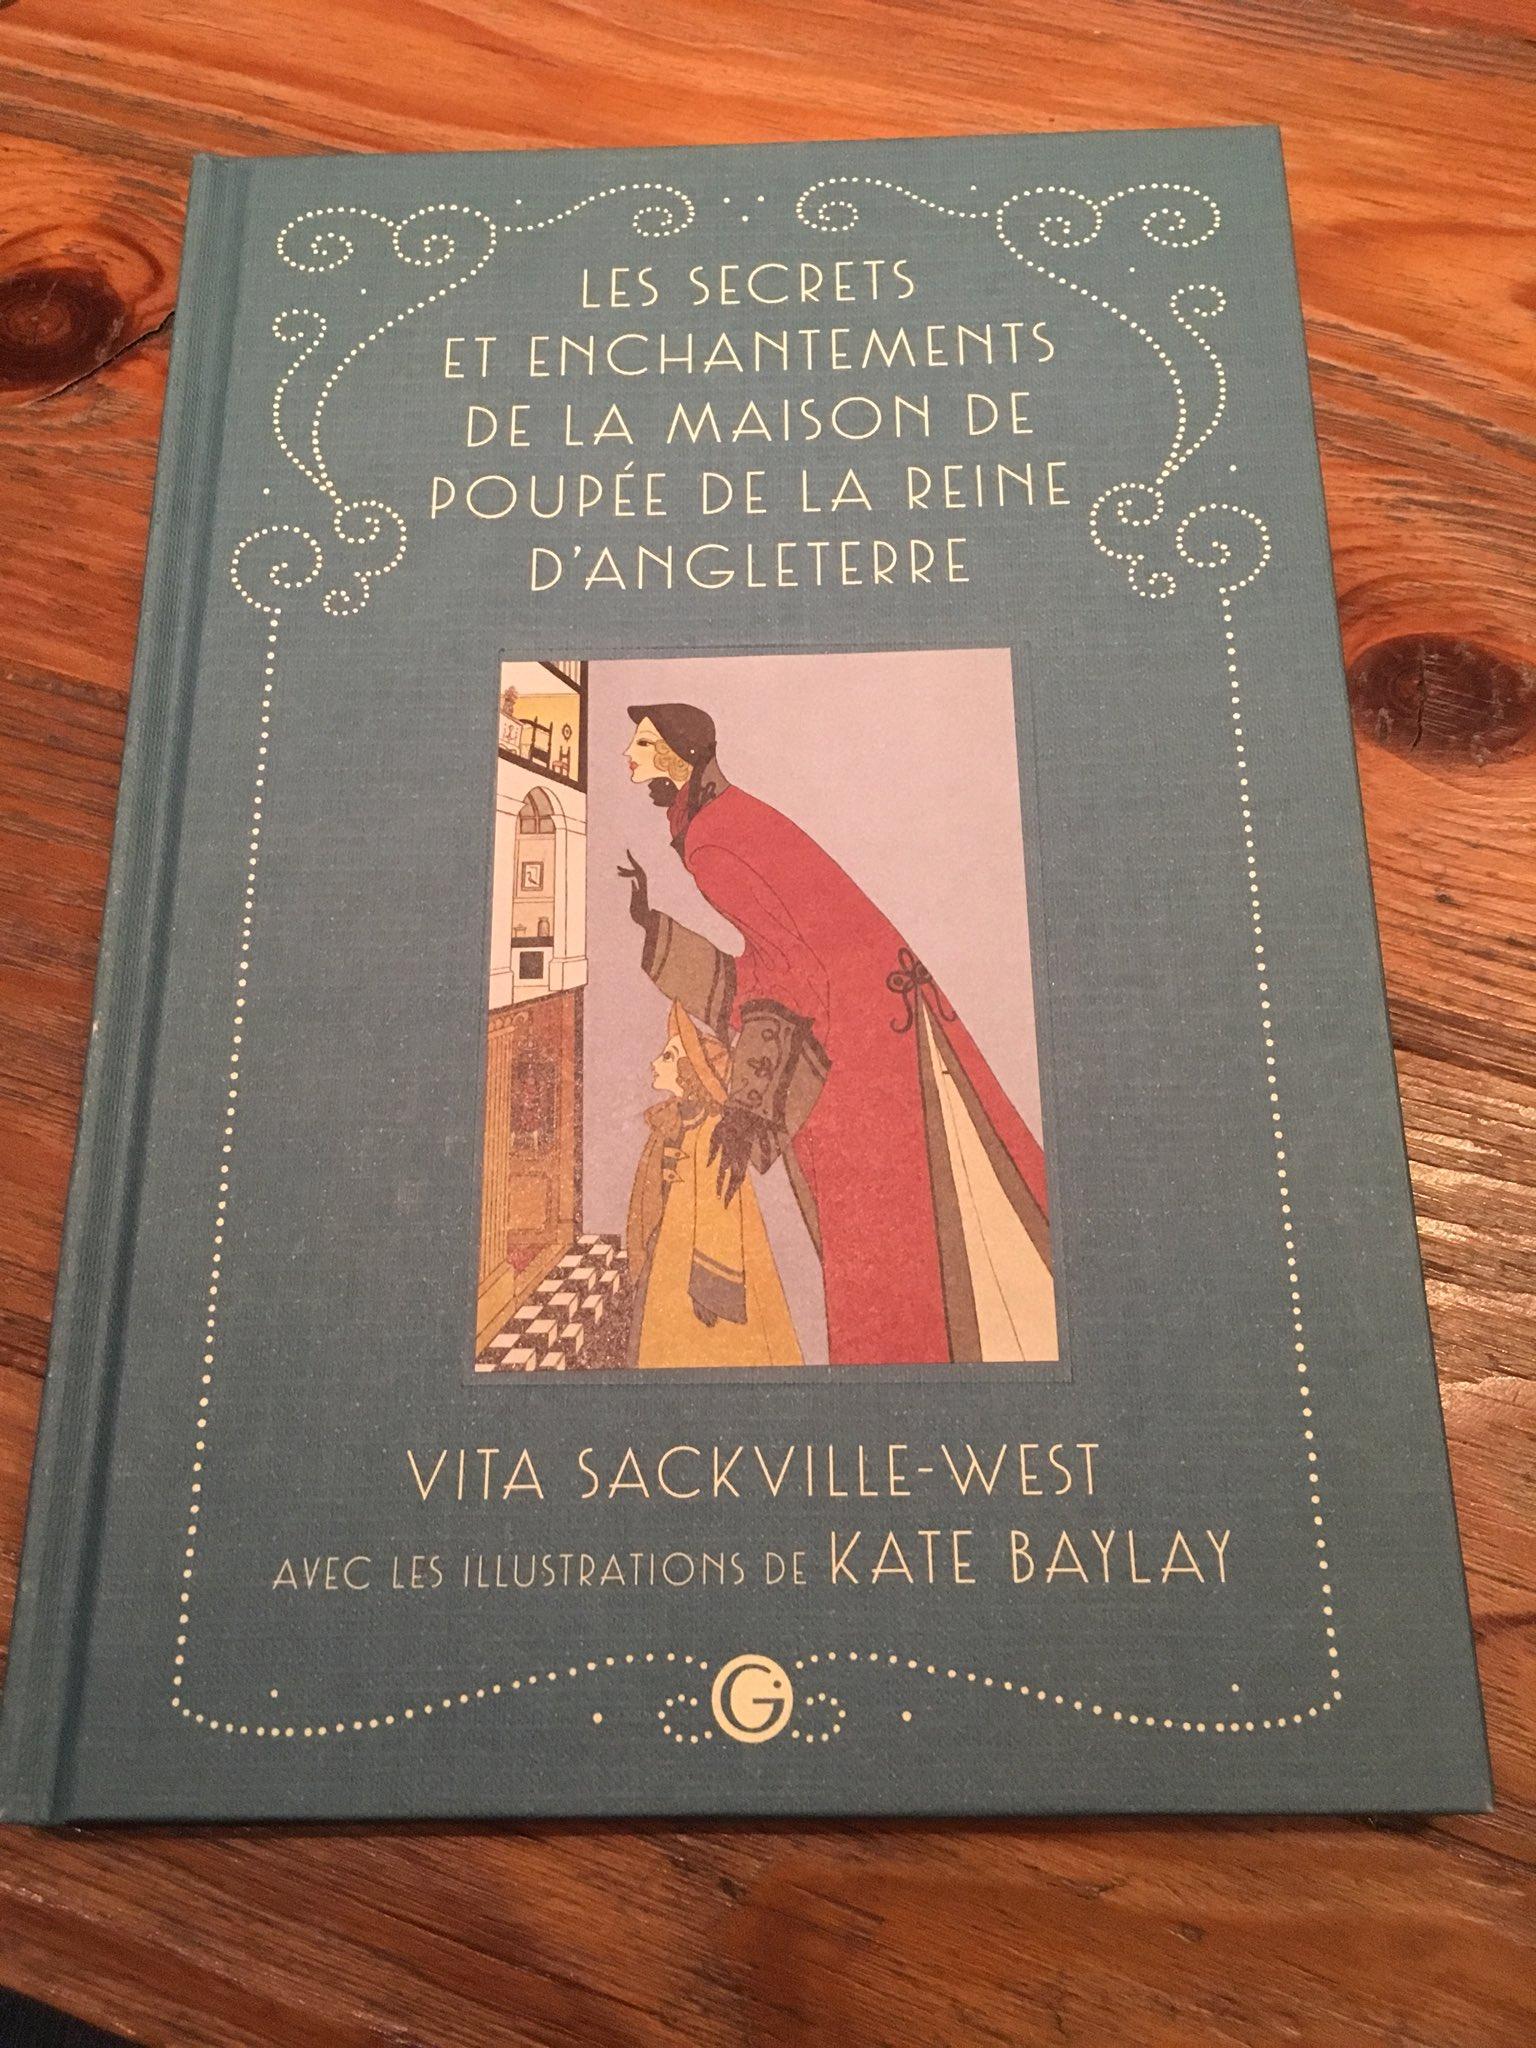 Catherine Maudry On Twitter Une Petite Merveille Livre Lecture Grasset Grassetjeunesse Payot Sion Dansmabibliotheque